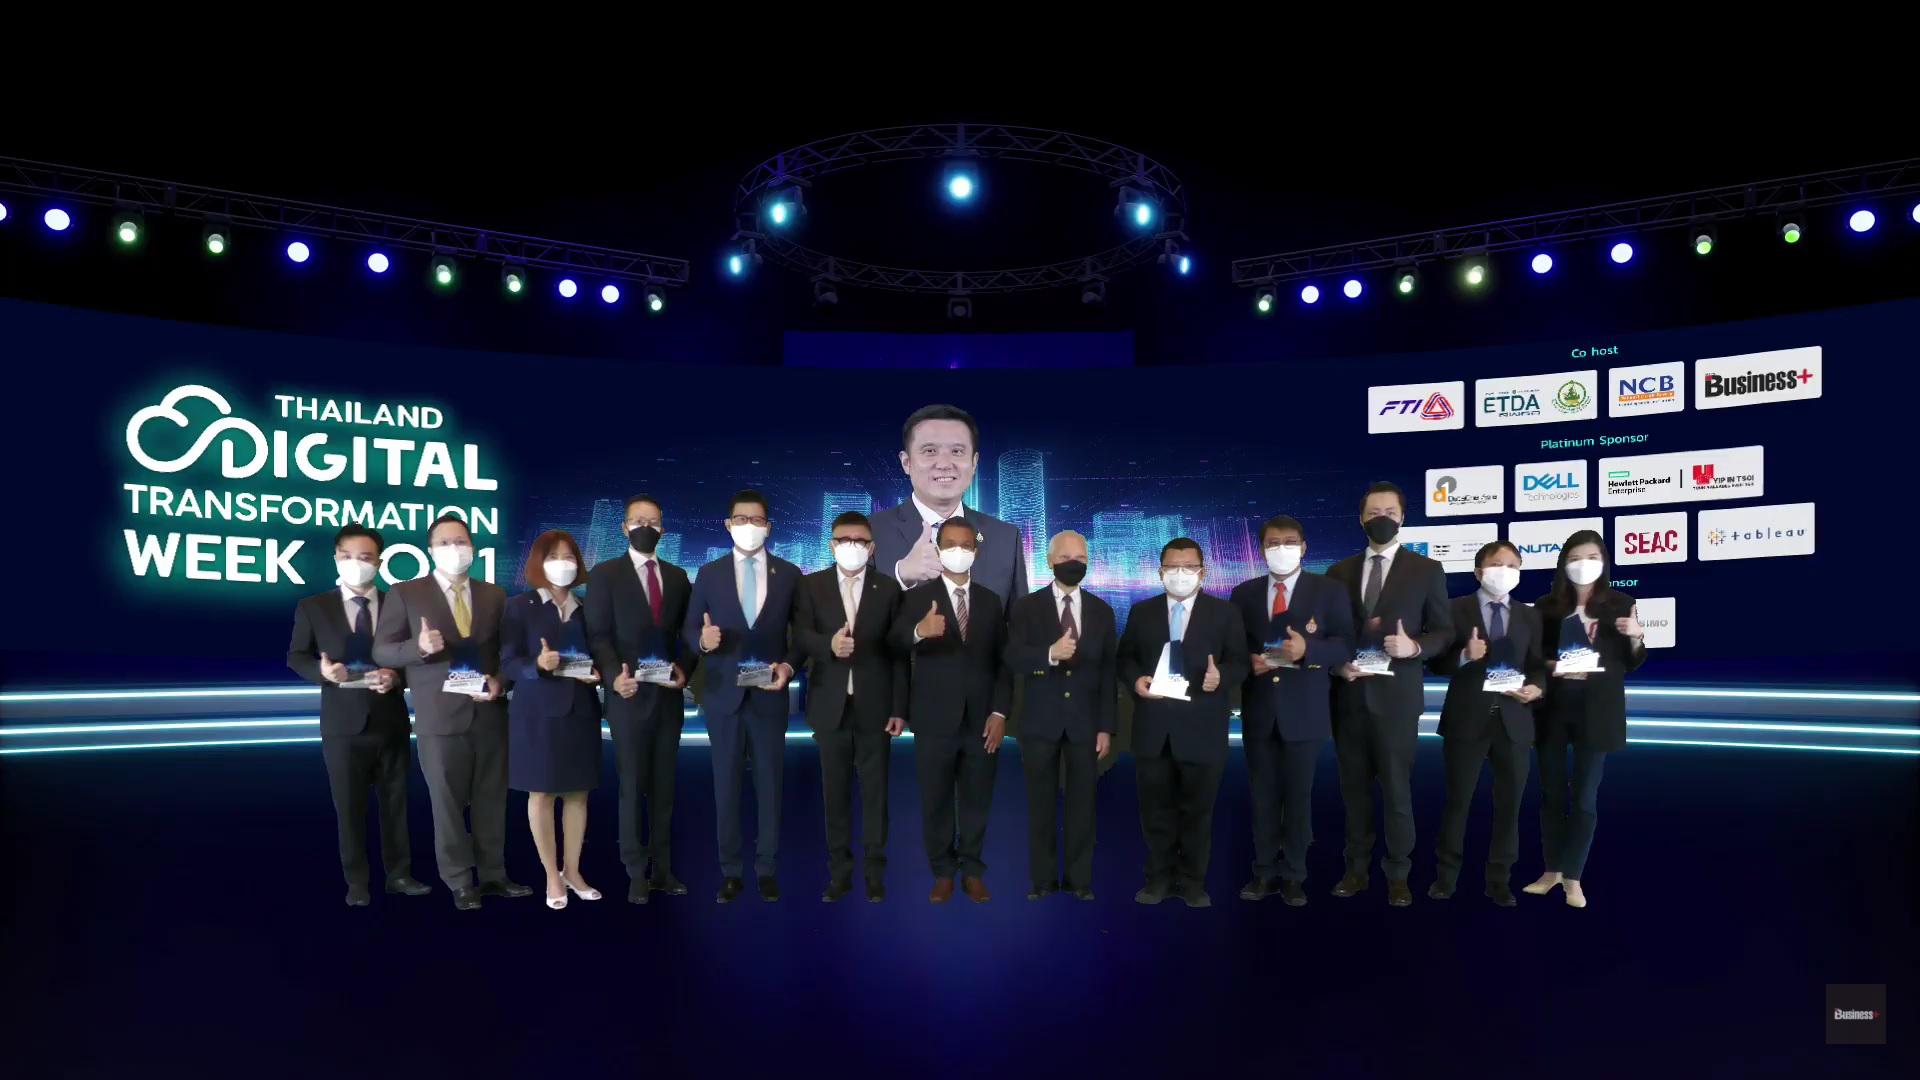 "ETDA จับมือ สภาอุตสาหกรรมฯ และ นิตยสาร Business+ จัดงาน ""THAILAND DIGITAL TRANSFORMATION WEEK 2021""  ดันธุรกิจไทย พร้อมทรานสฟอร์มสู่องค์กรดิจิทัล"